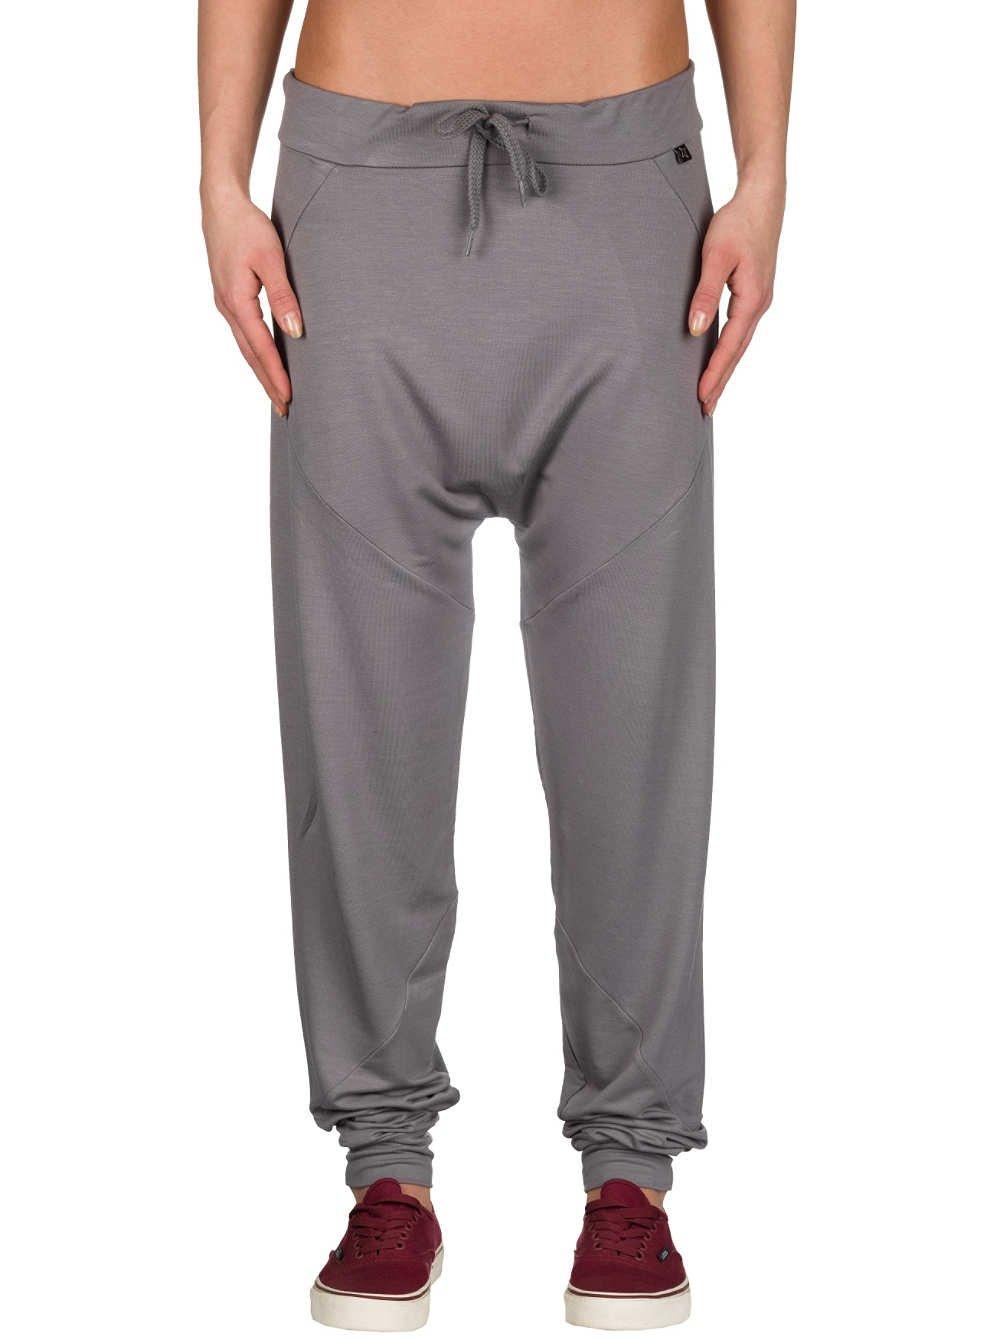 Nikita Women's Bandit Pant, Frosted Grey, X-Large